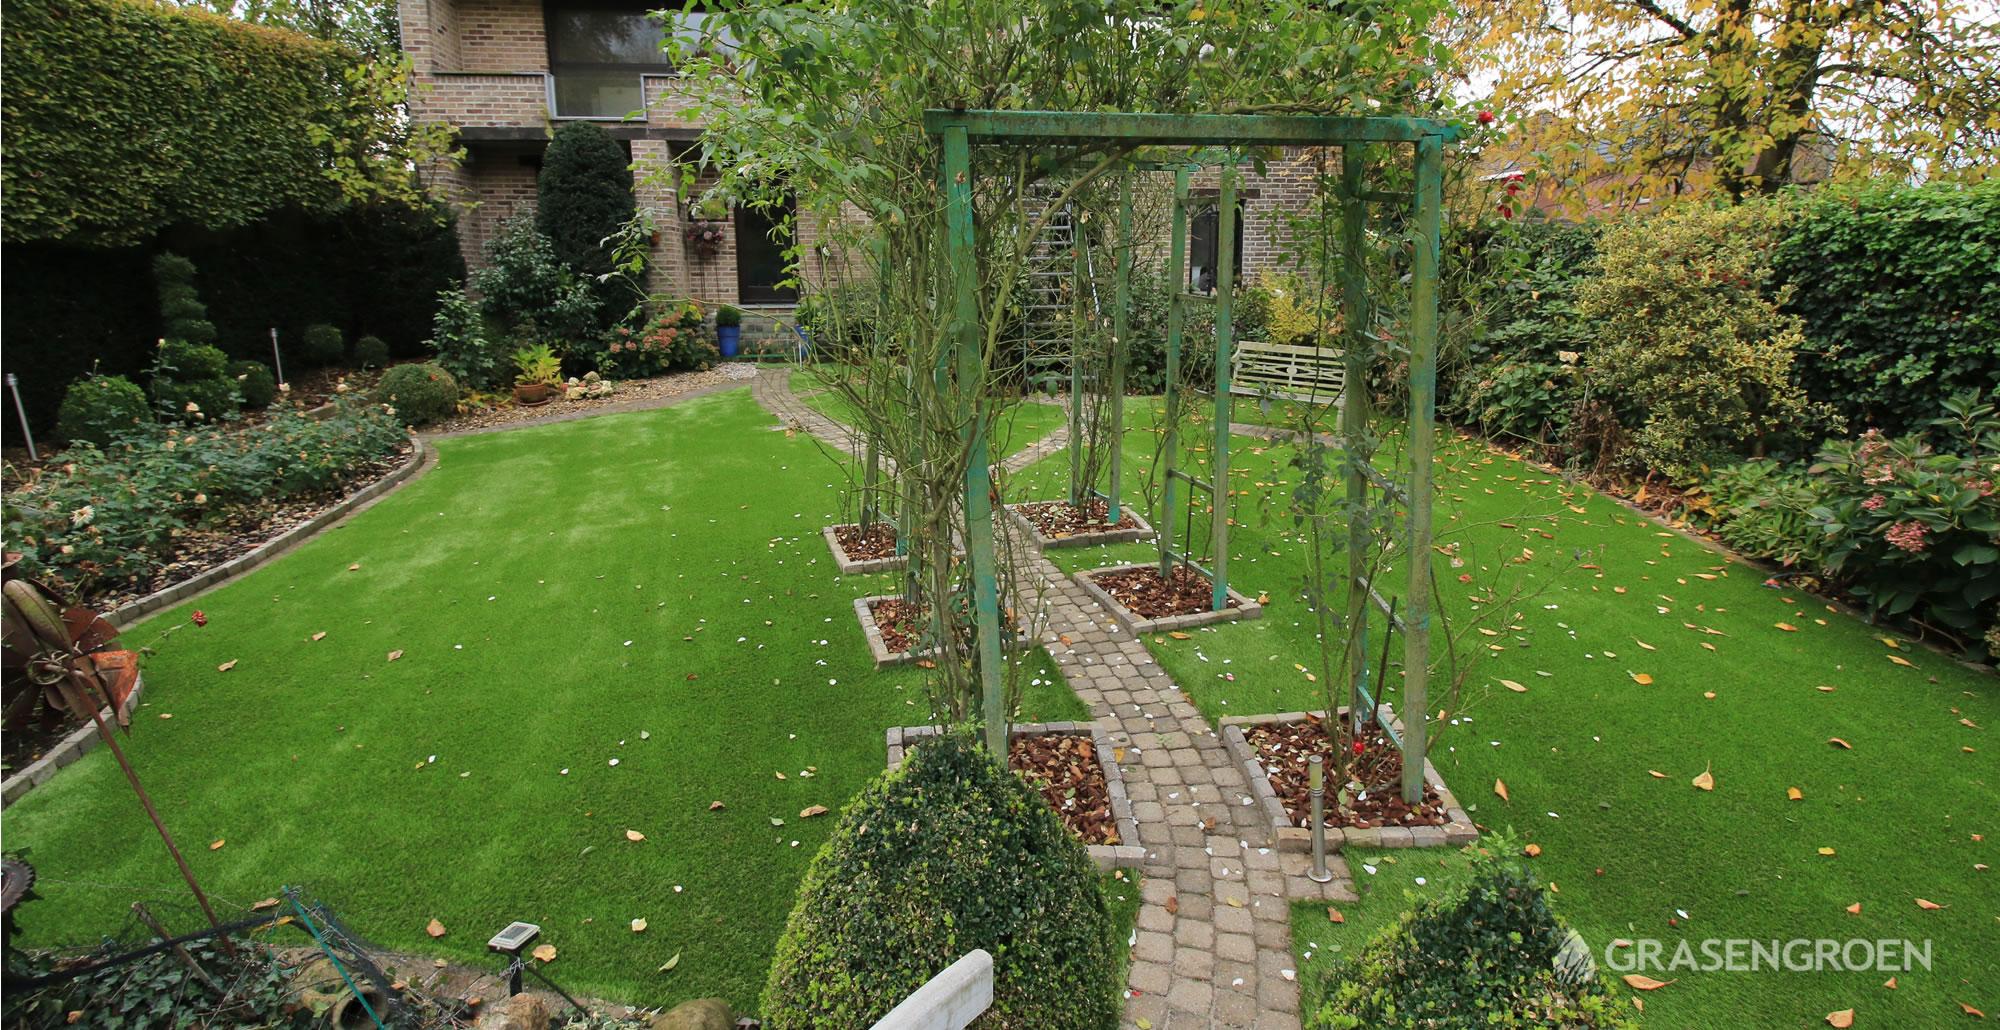 Kunstgrasleggensintjoriswinge15 • Gras en Groen Kunstgras